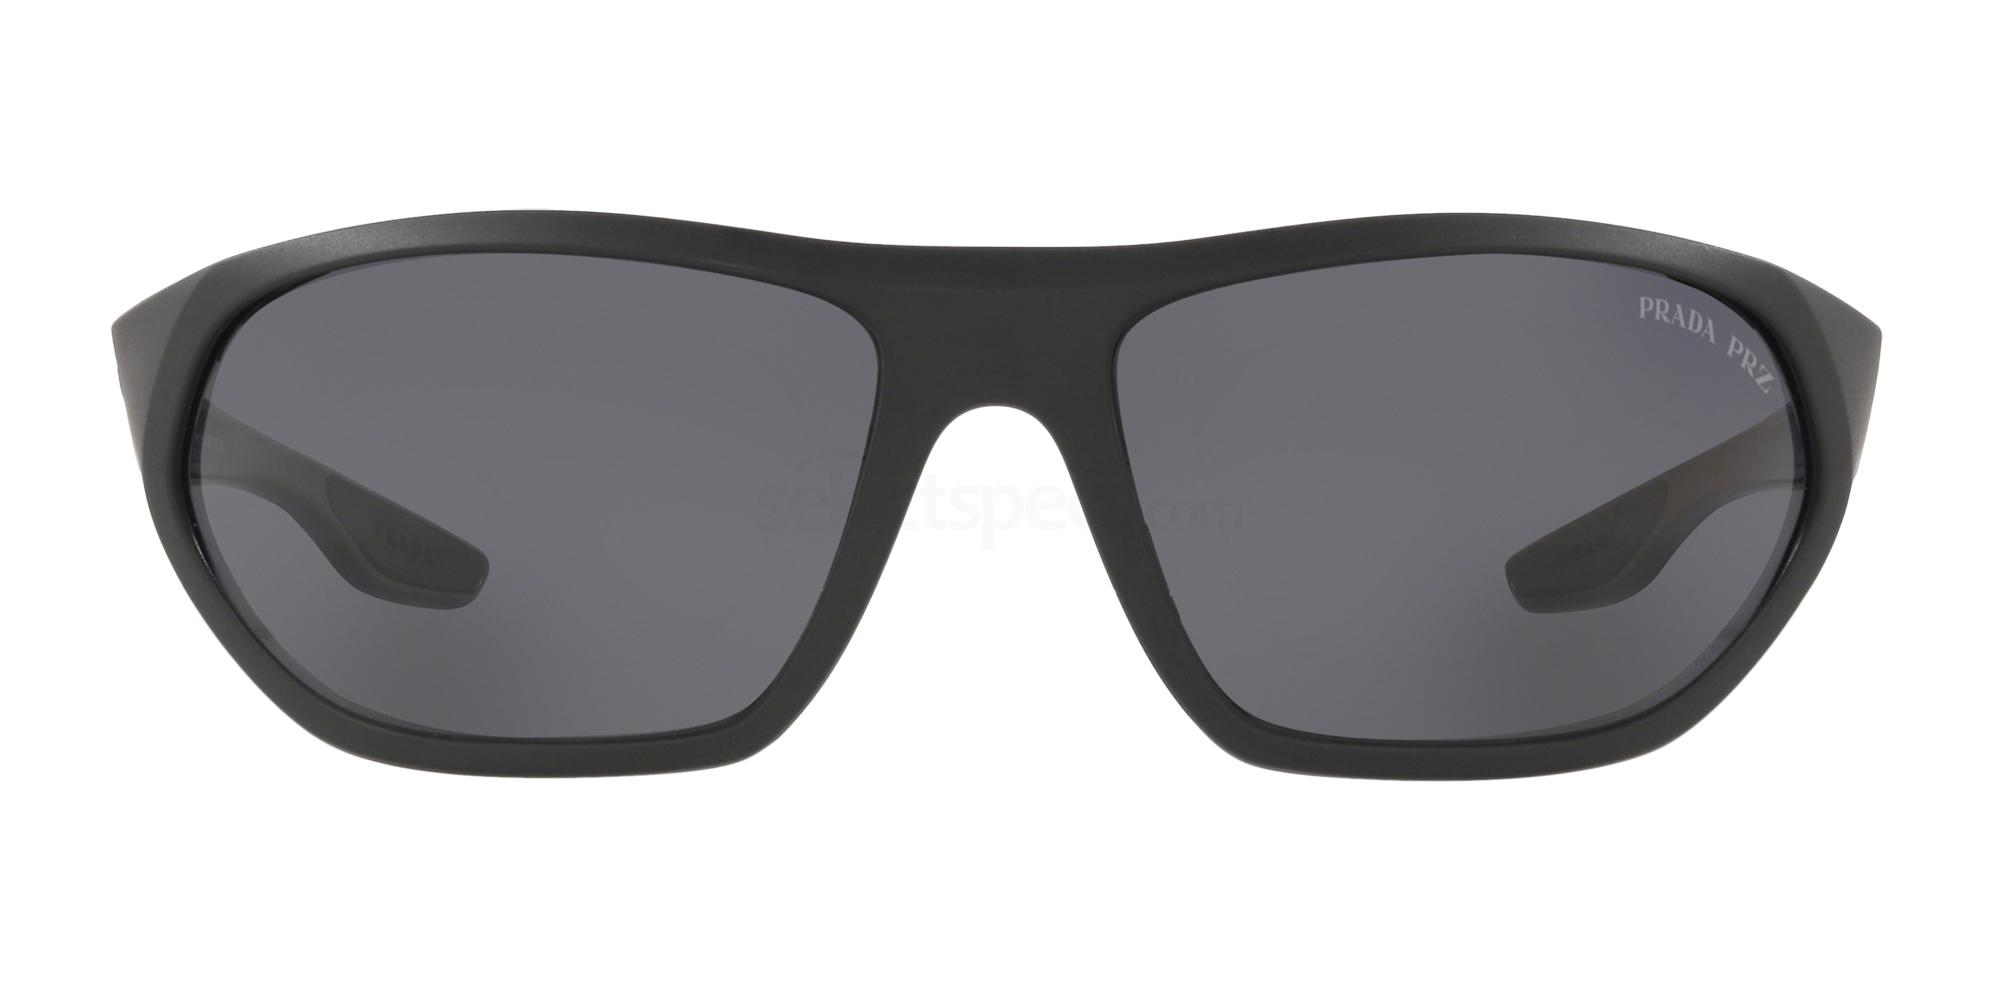 1BO5Z1 PS 18US Sunglasses, Prada Linea Rossa